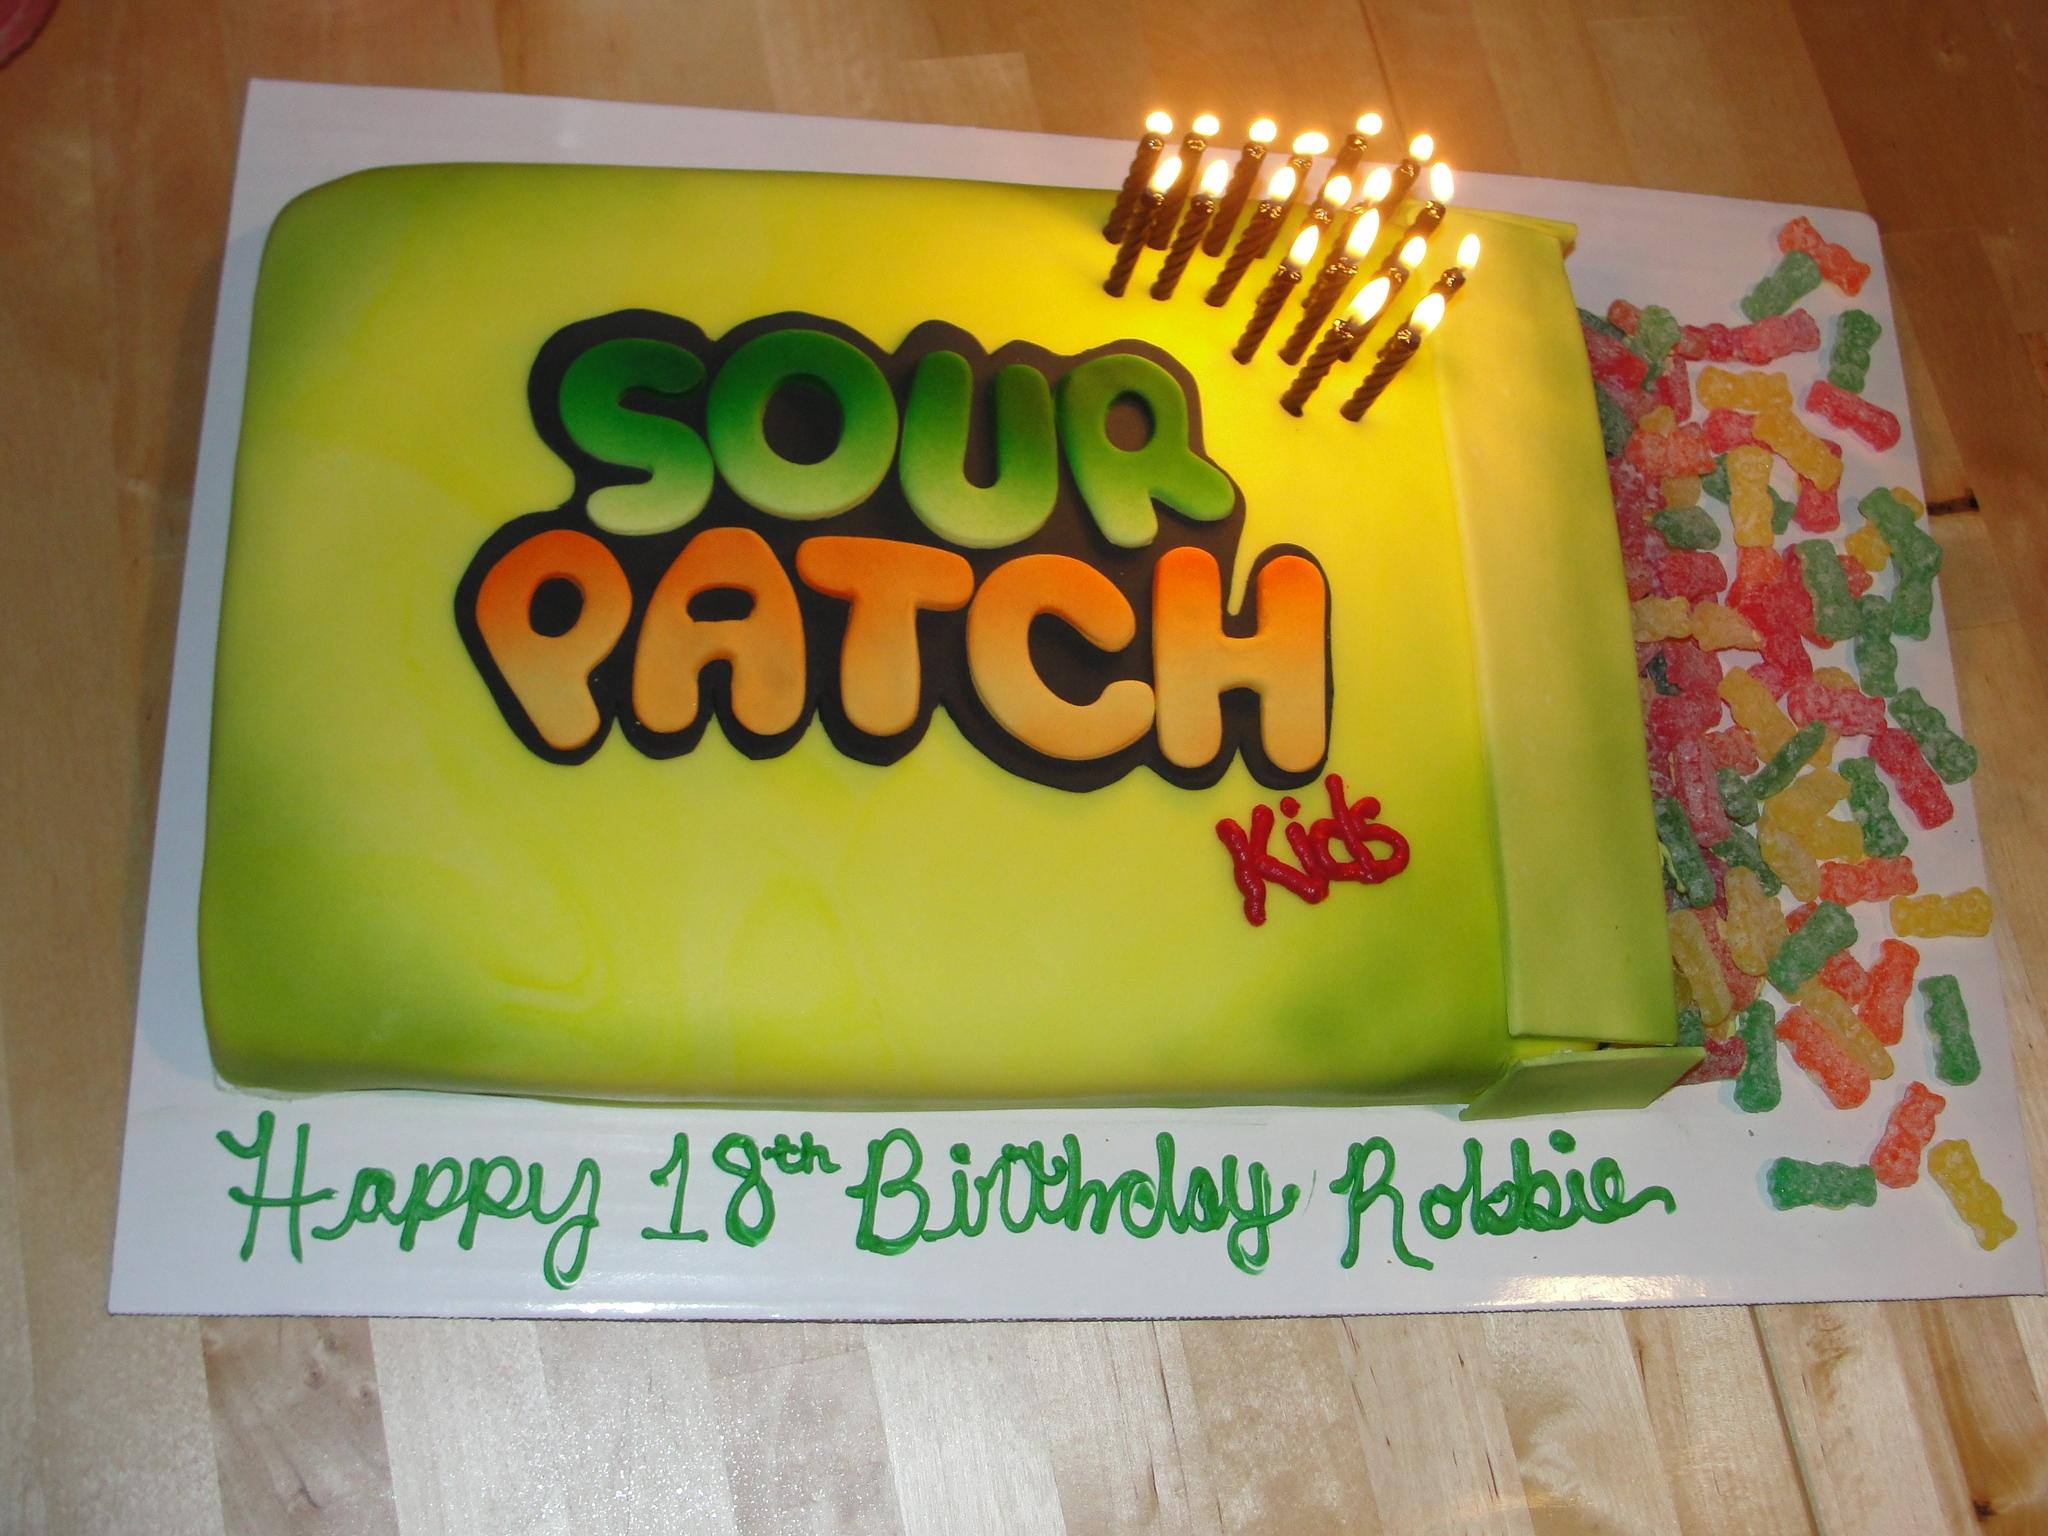 Sour Patch Kids Birthday Cake